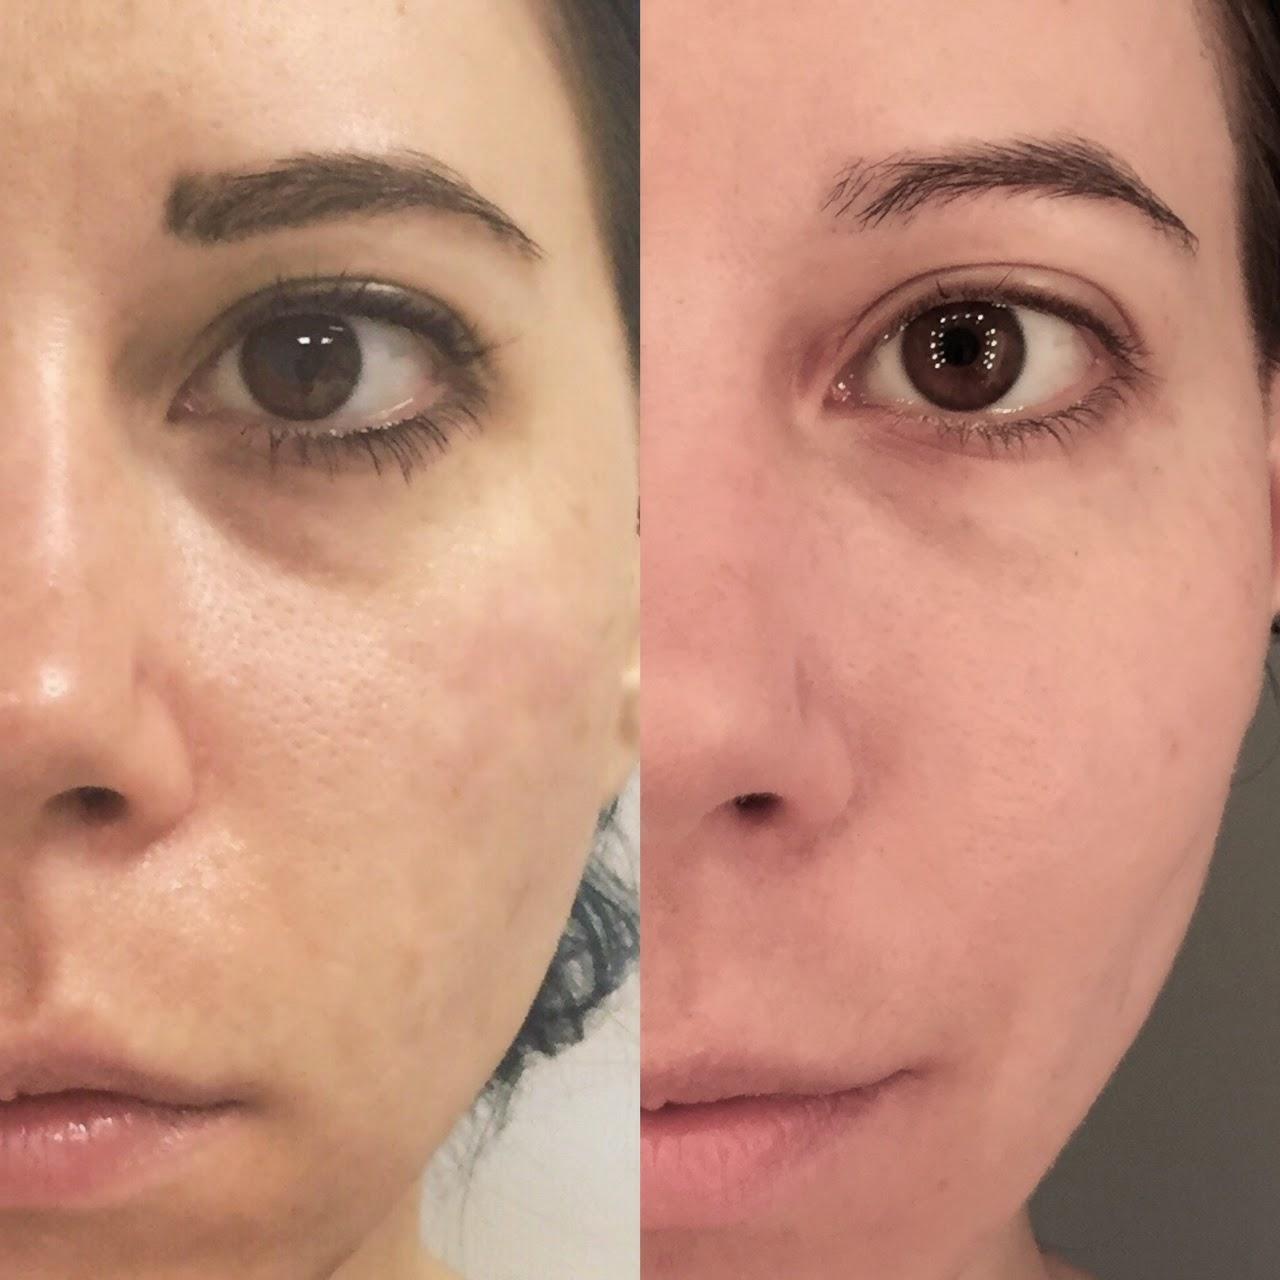 Estee Lauder Advanced Night Repair Before After Eye Creams